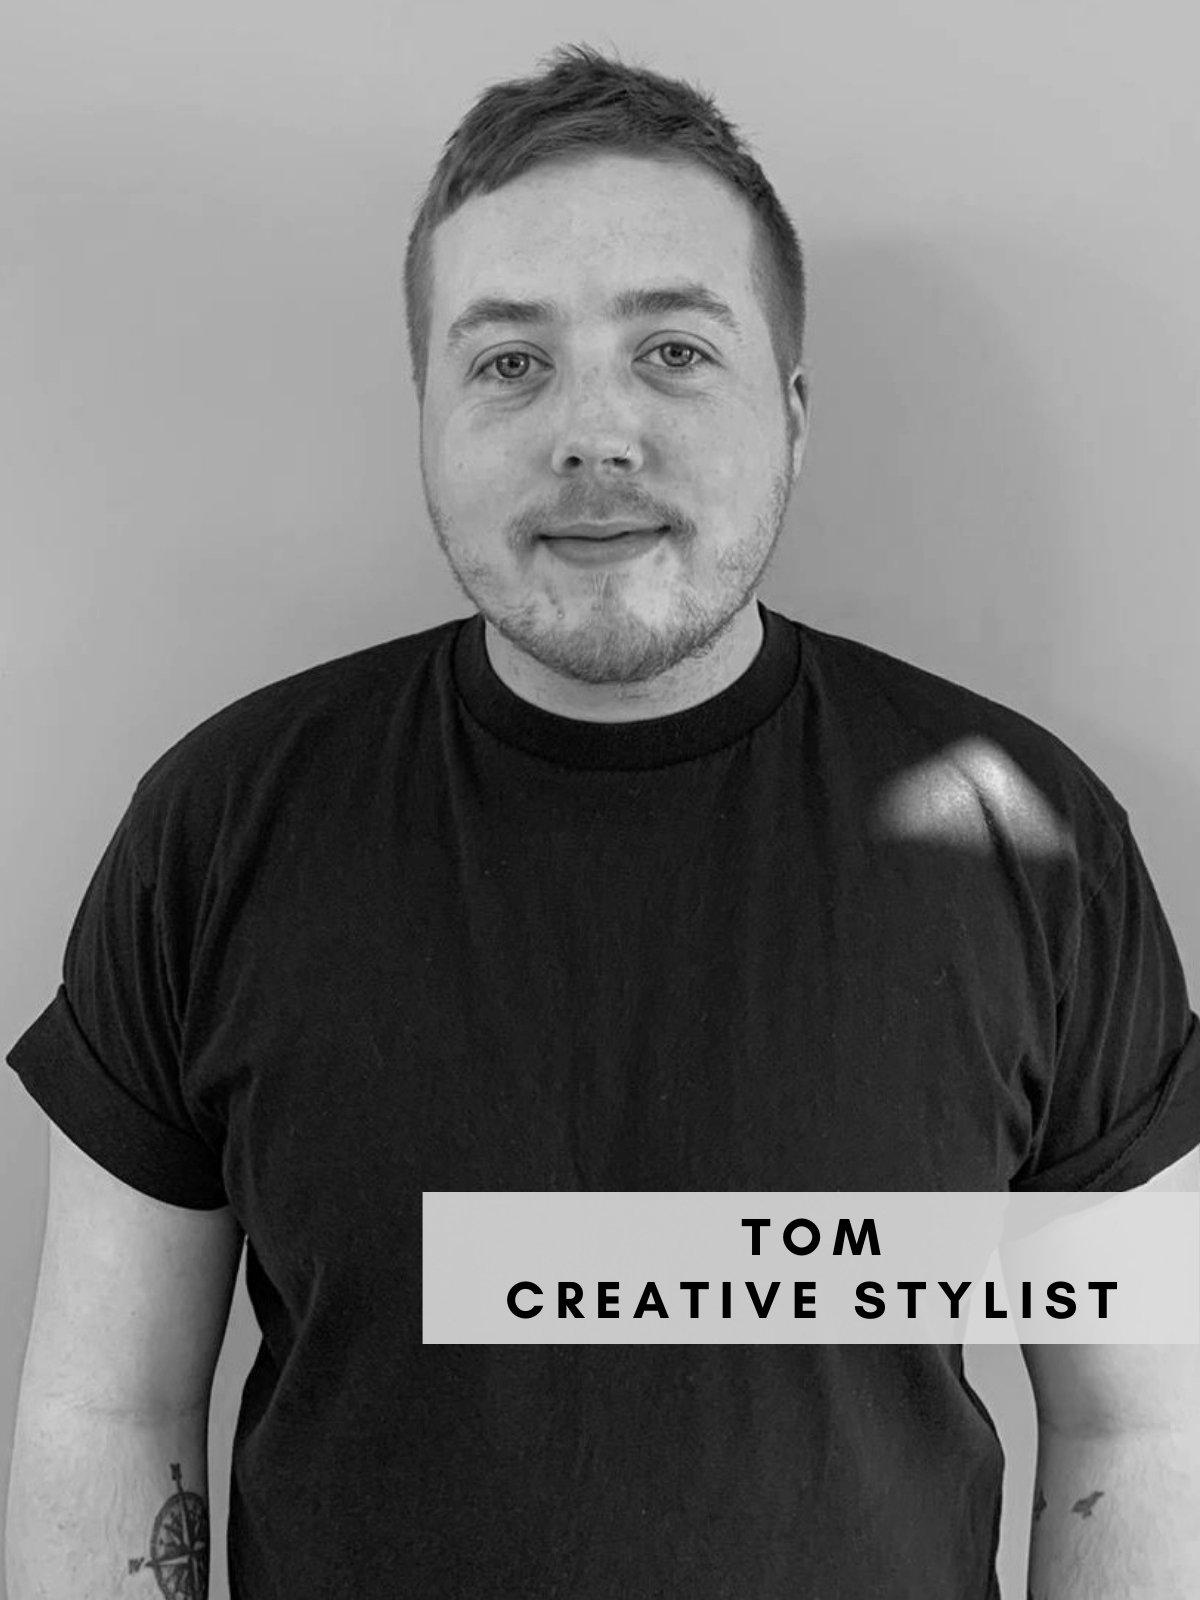 Tom – Creative Stylist